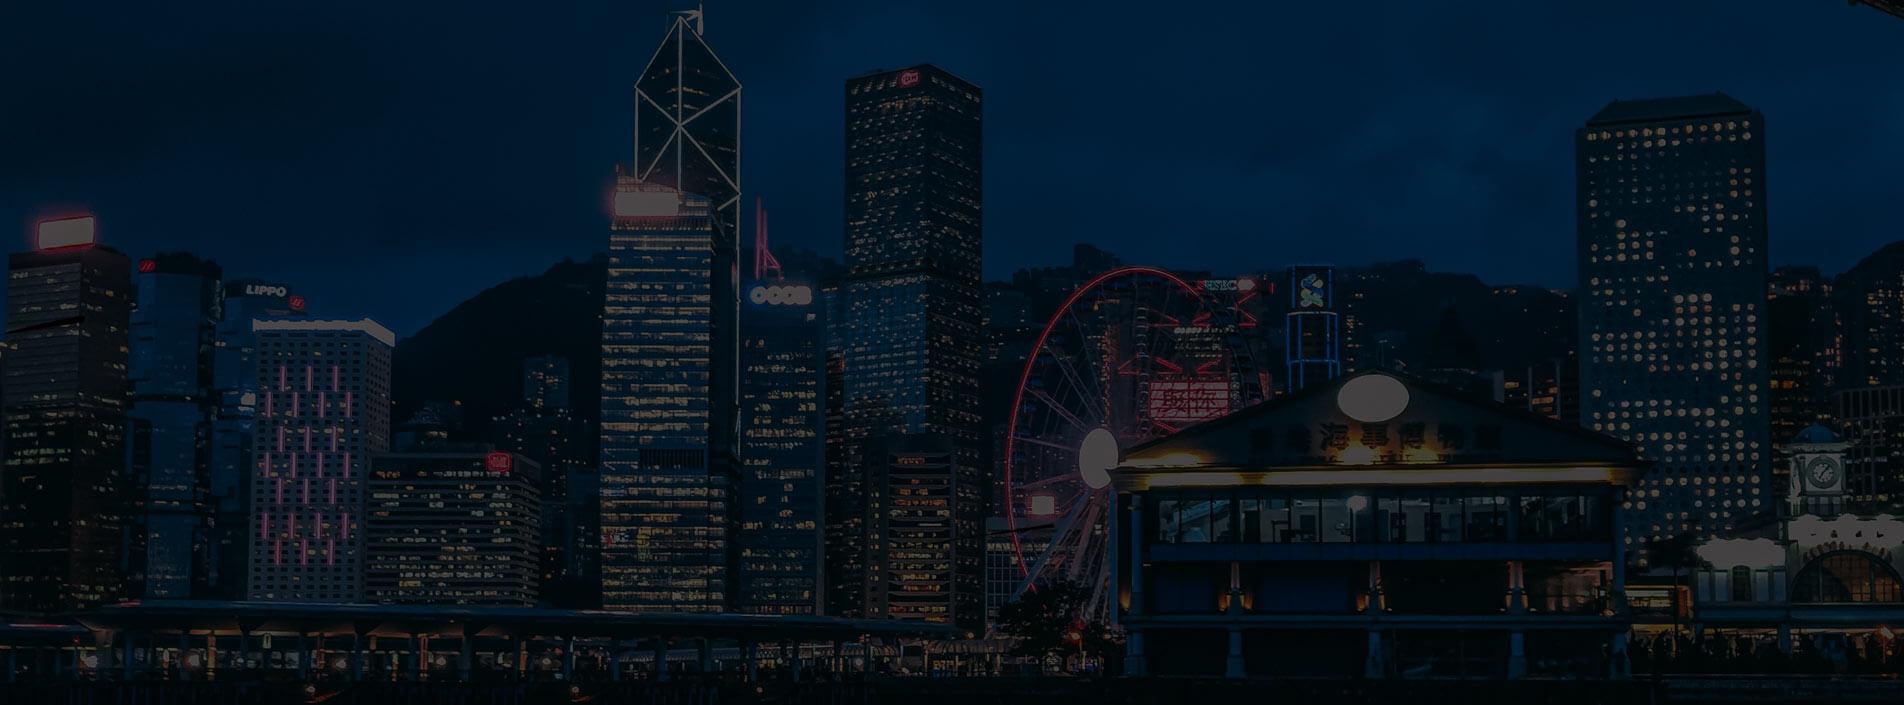 香港都会区